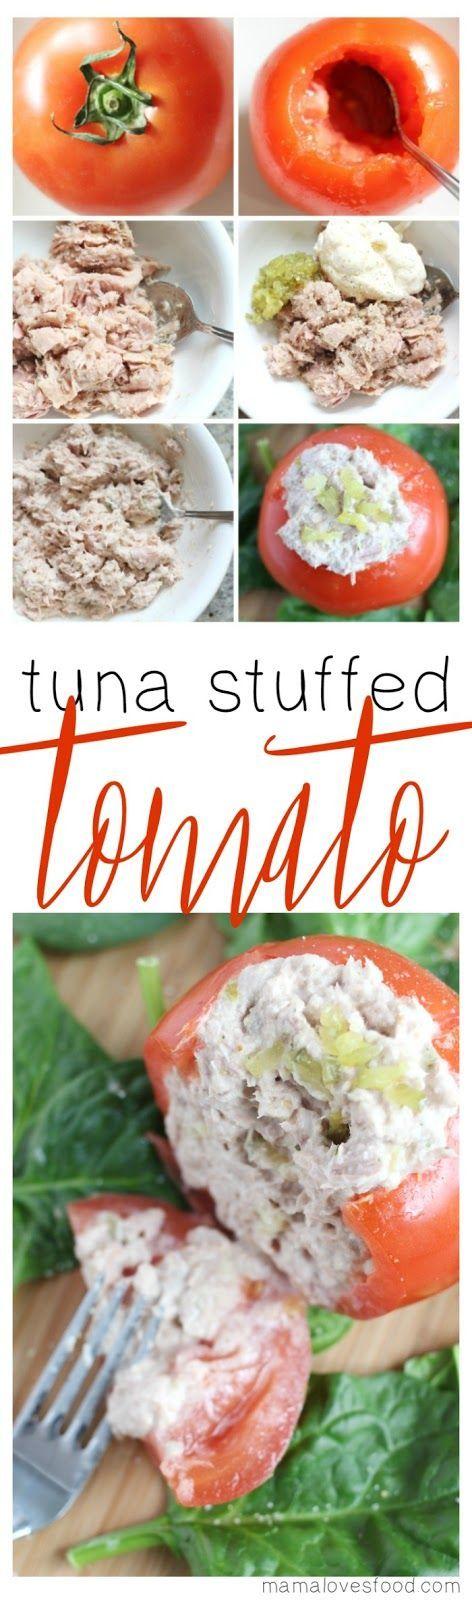 Tuna Salad Stuffed Tomato Recipe